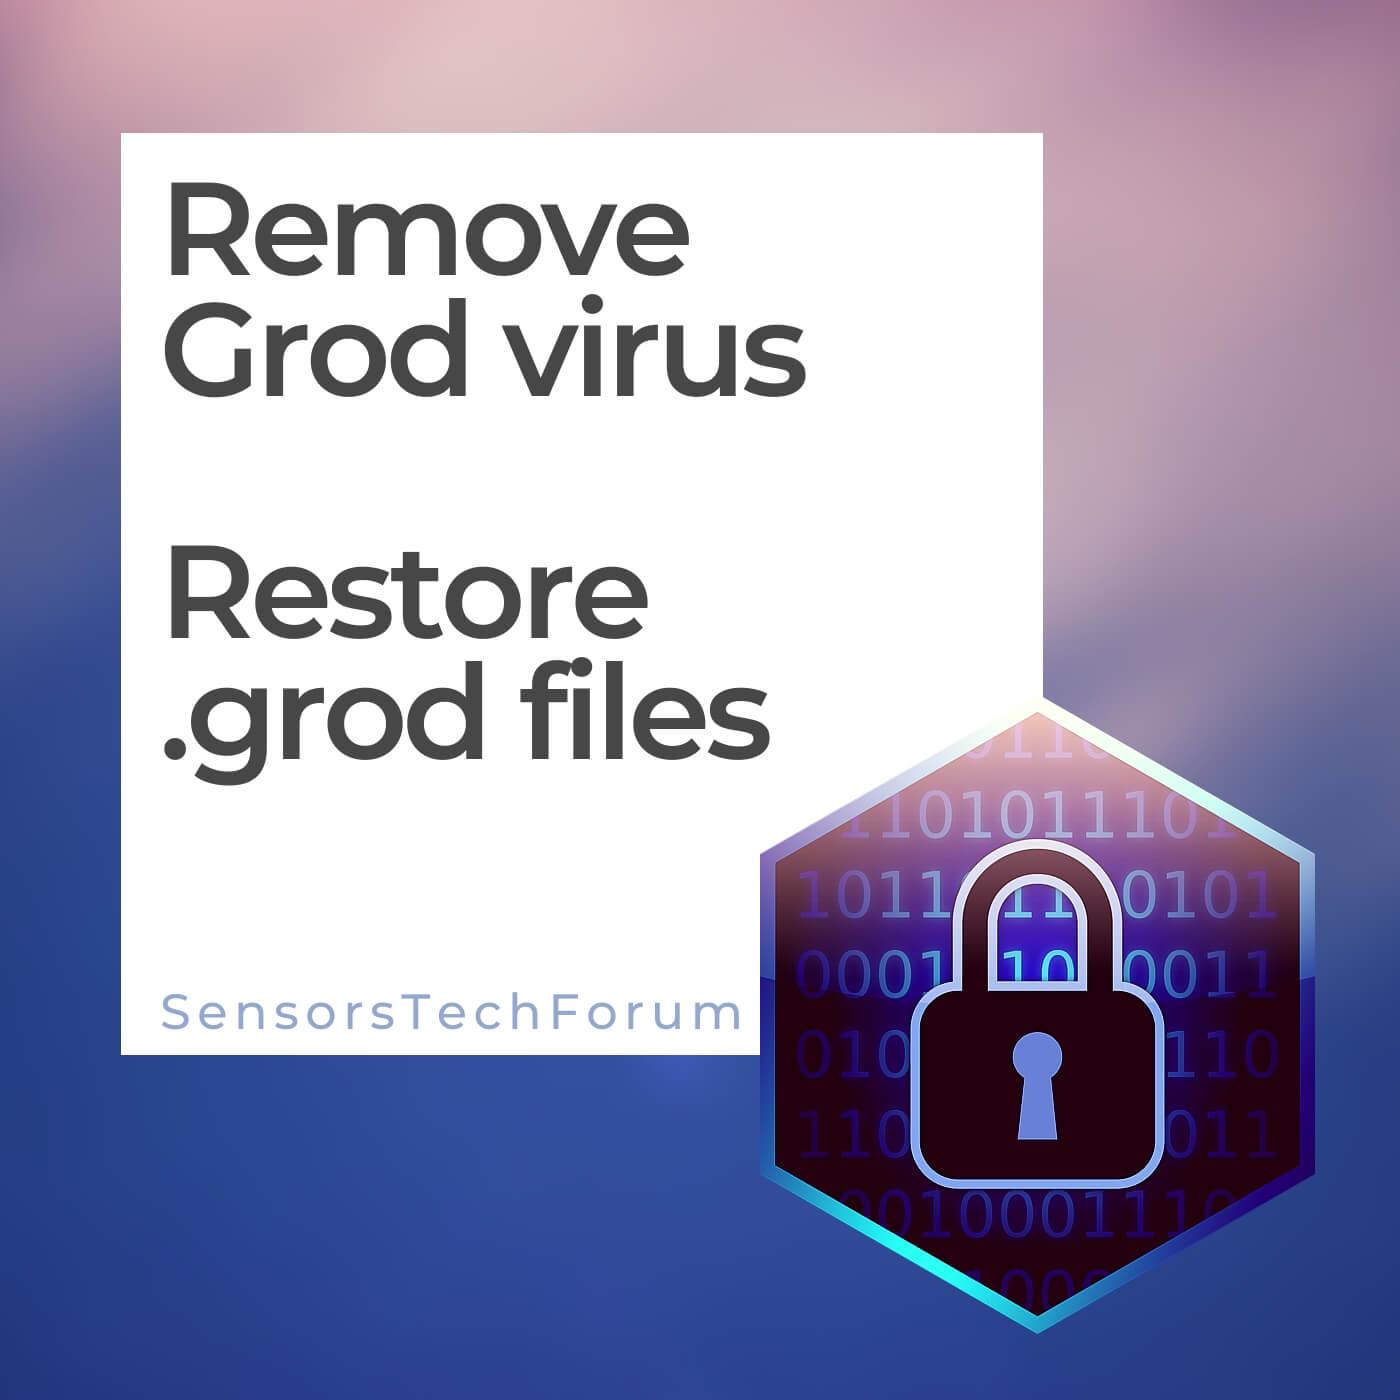 remove grod ransomware virus restore .grod files sensorstechforum